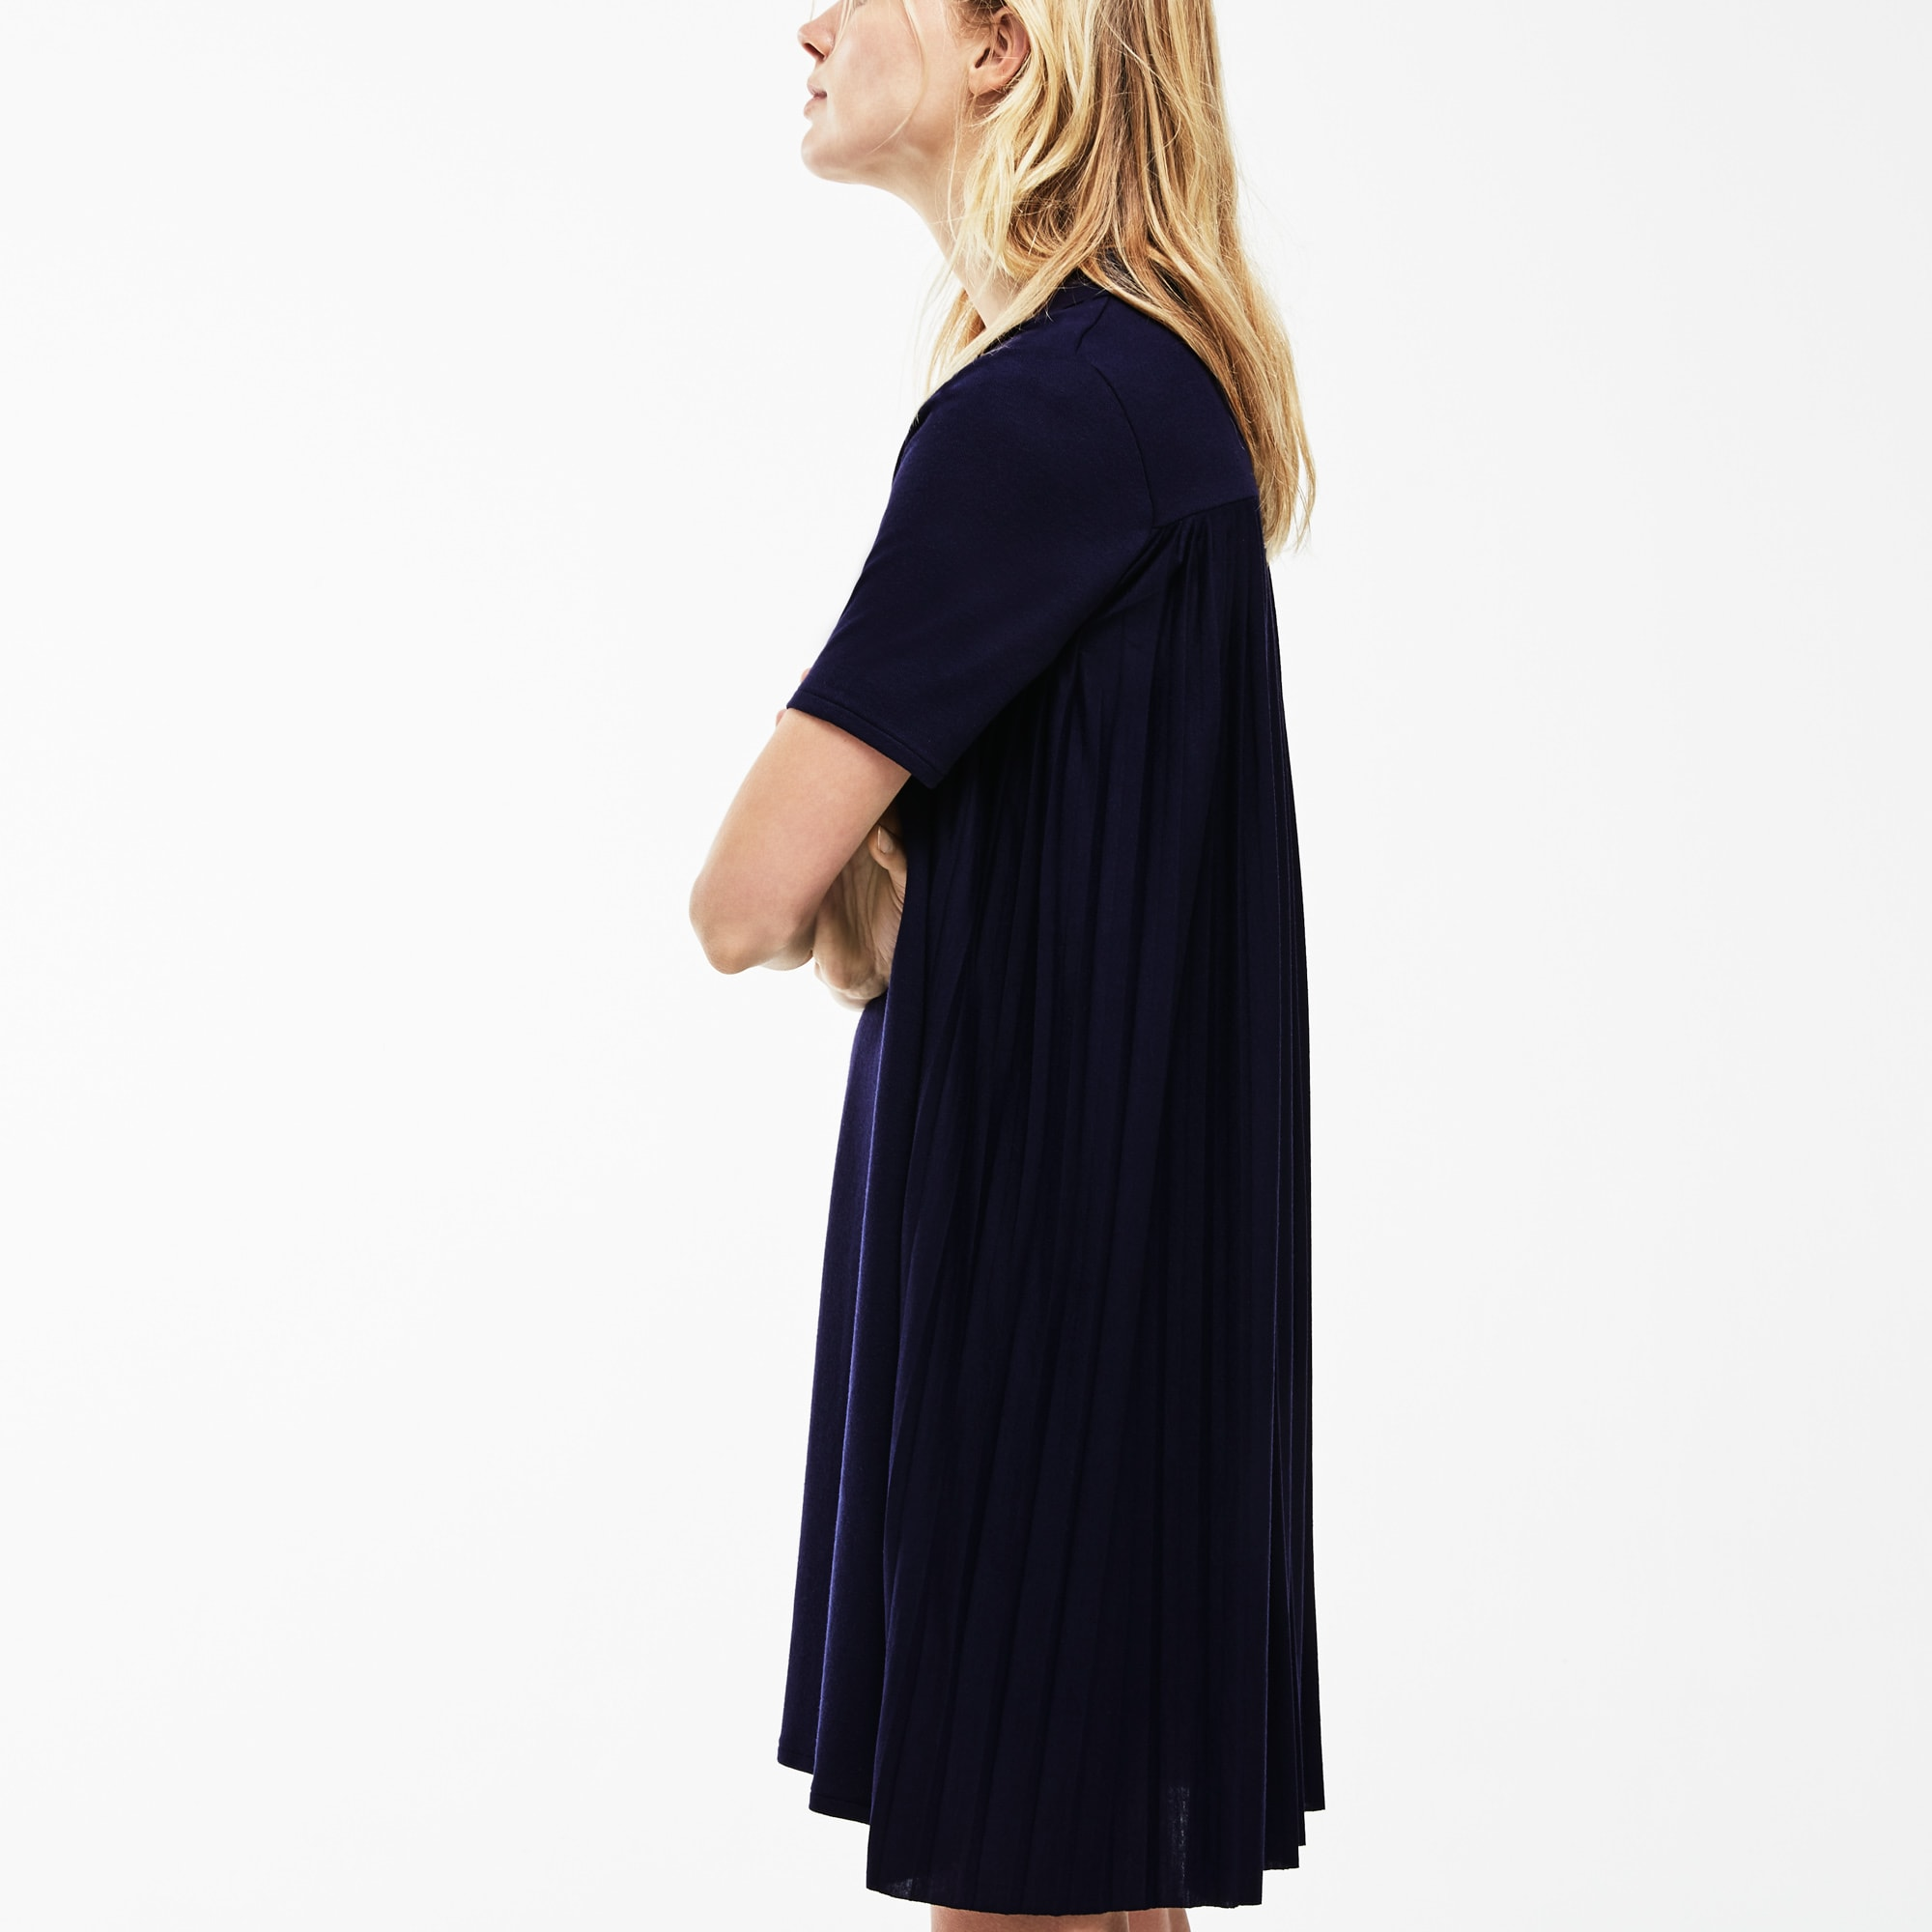 Lacoste WOMEN'S PLEATED PANEL PIQUÉ POLO DRESS